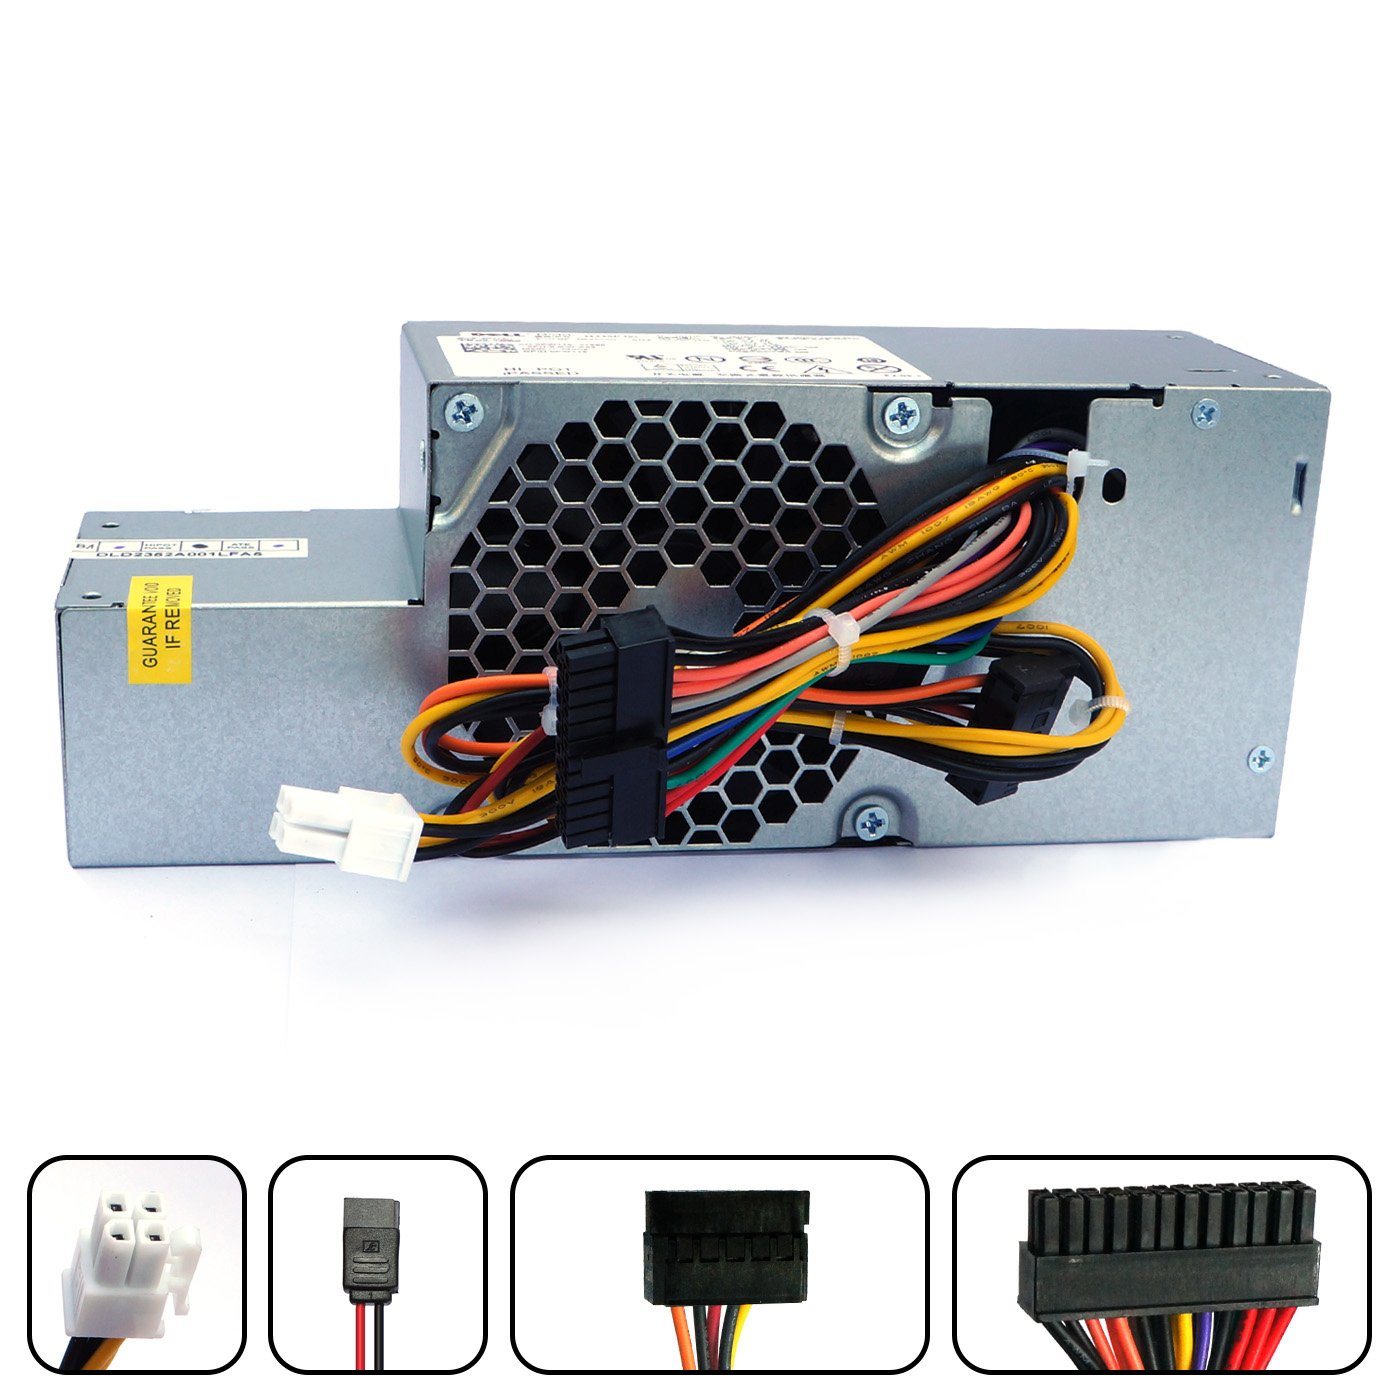 PW116 WU136 235W Desktop Power Supply For Dell Optiplex 760 780 960 980 Small Form Factor (SFF) Systems FR610 6RG54 MPF5F N6D7N RM112 67T67 R225M R224M H255T H235P-00 L235P-01 D235ES-00 F235E-00